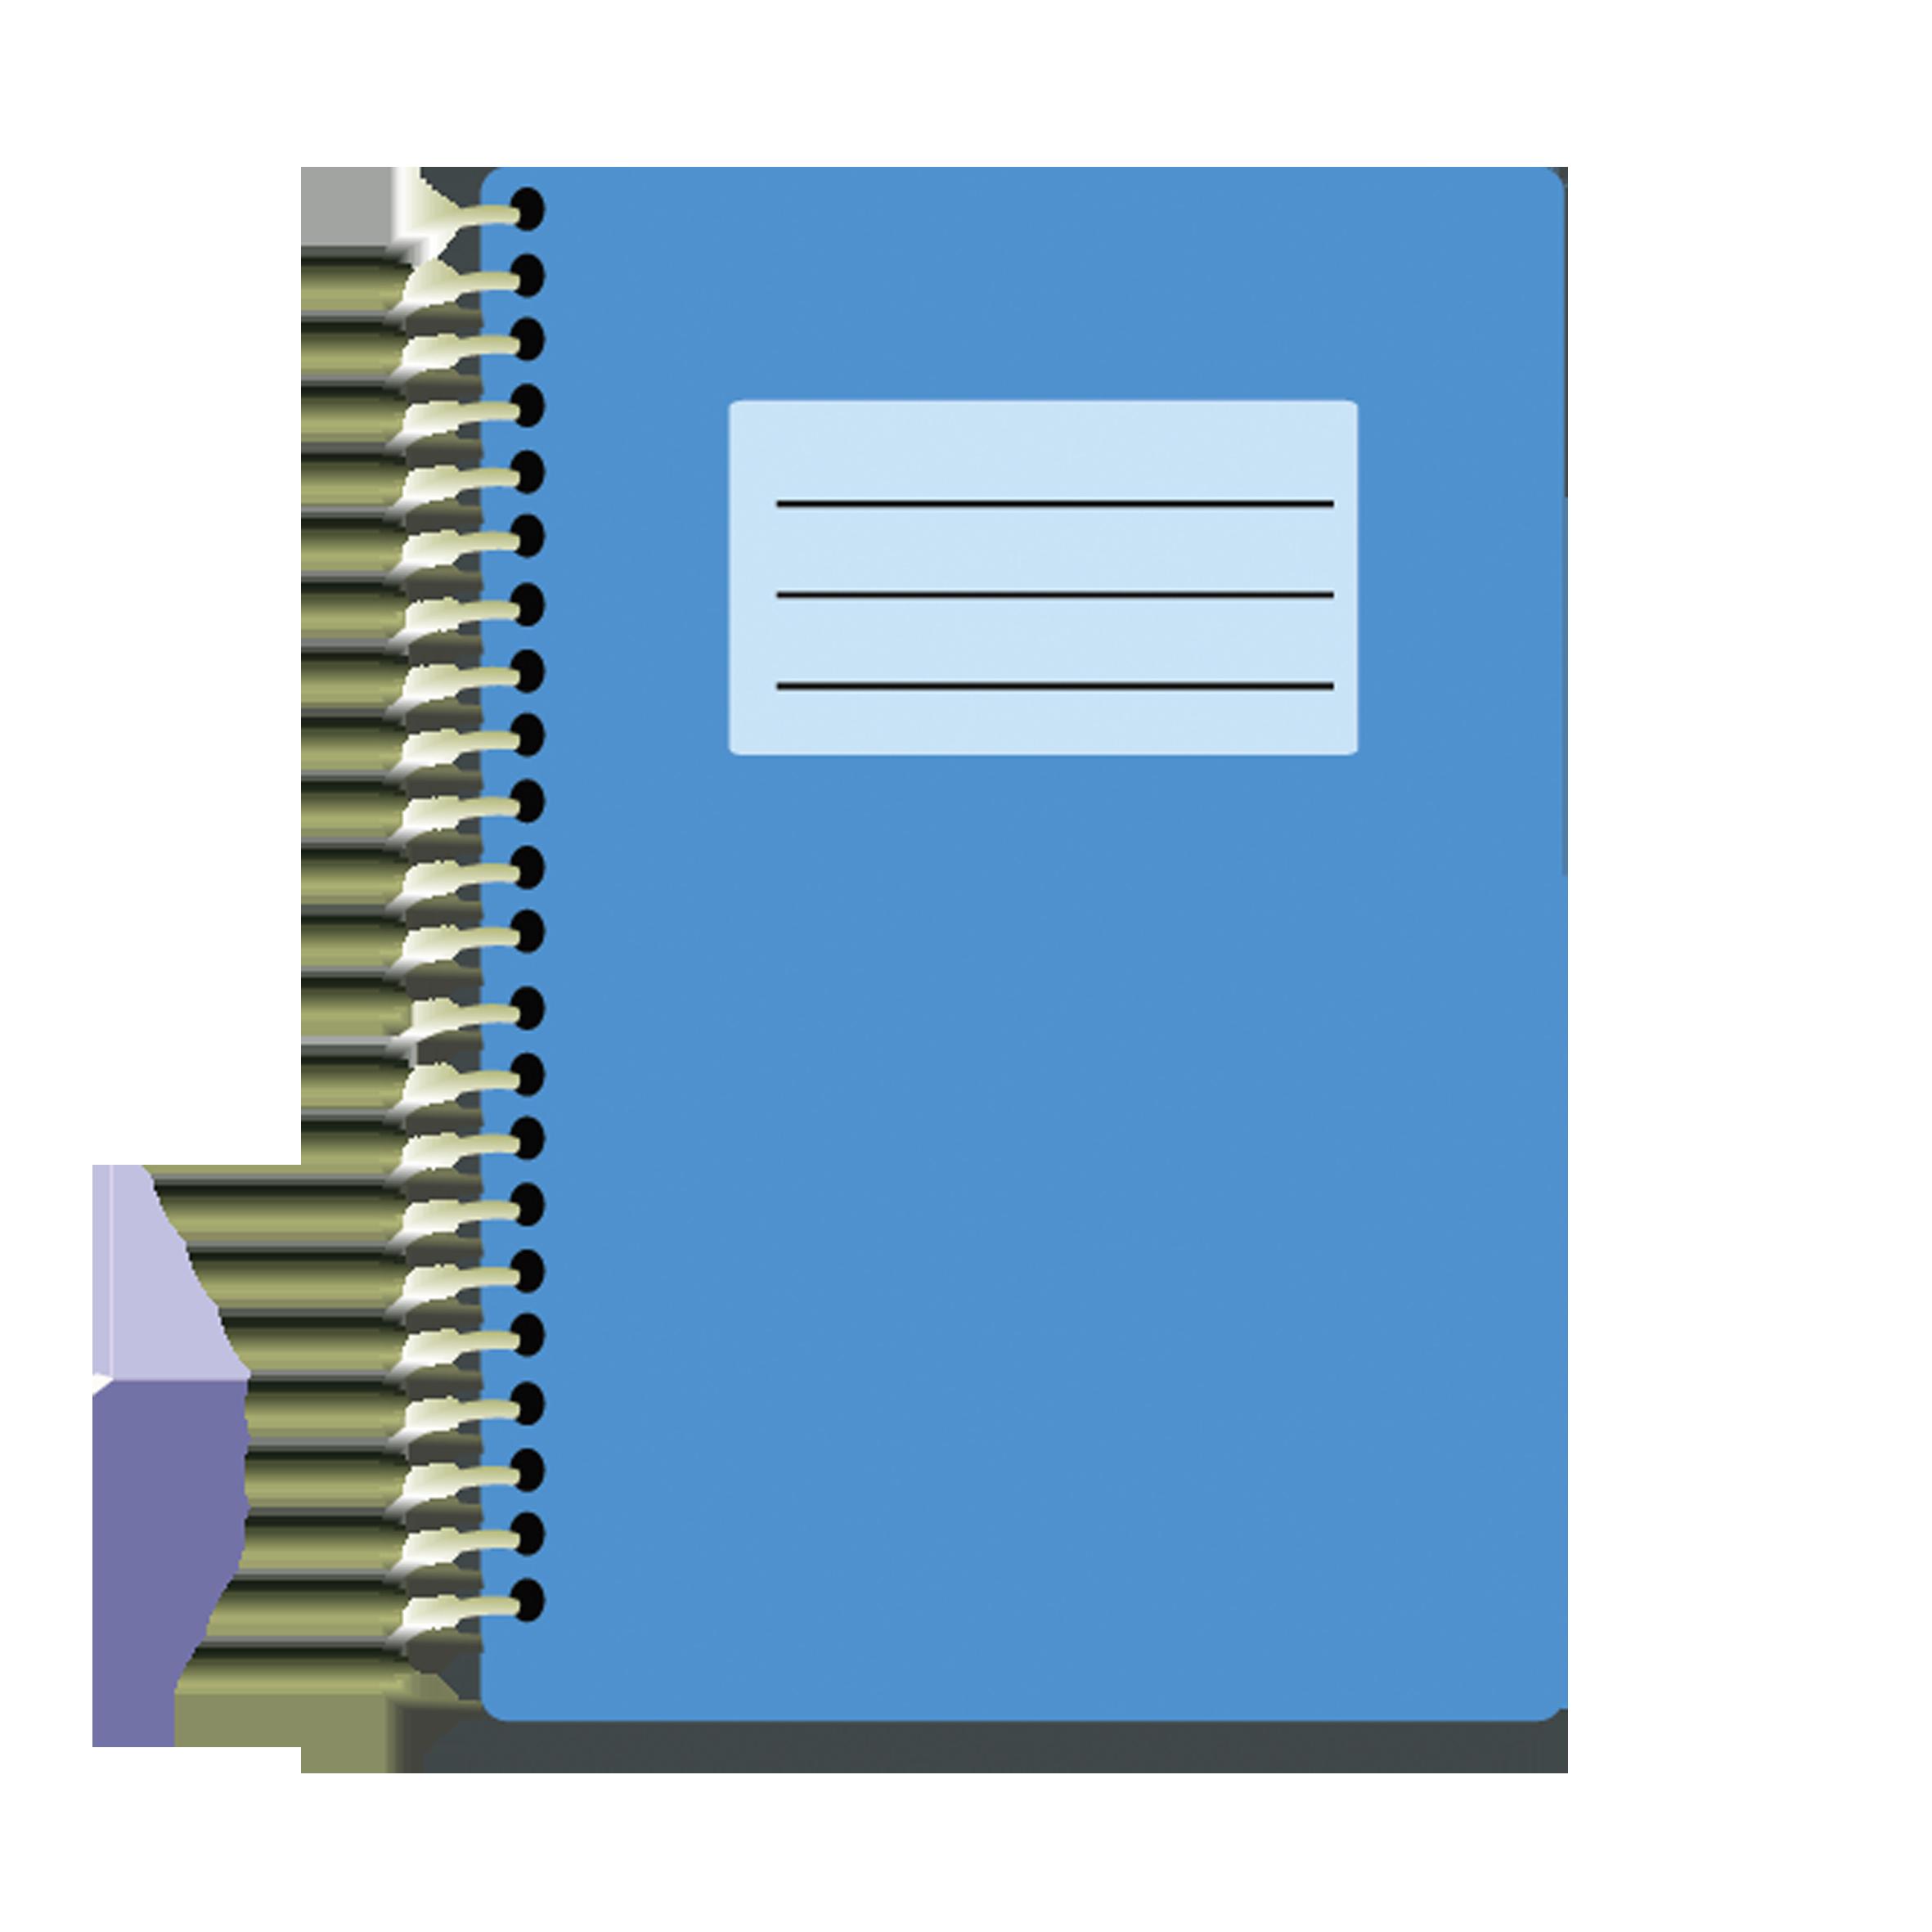 Adobe illustrator png download. Notebook clipart blue notebook